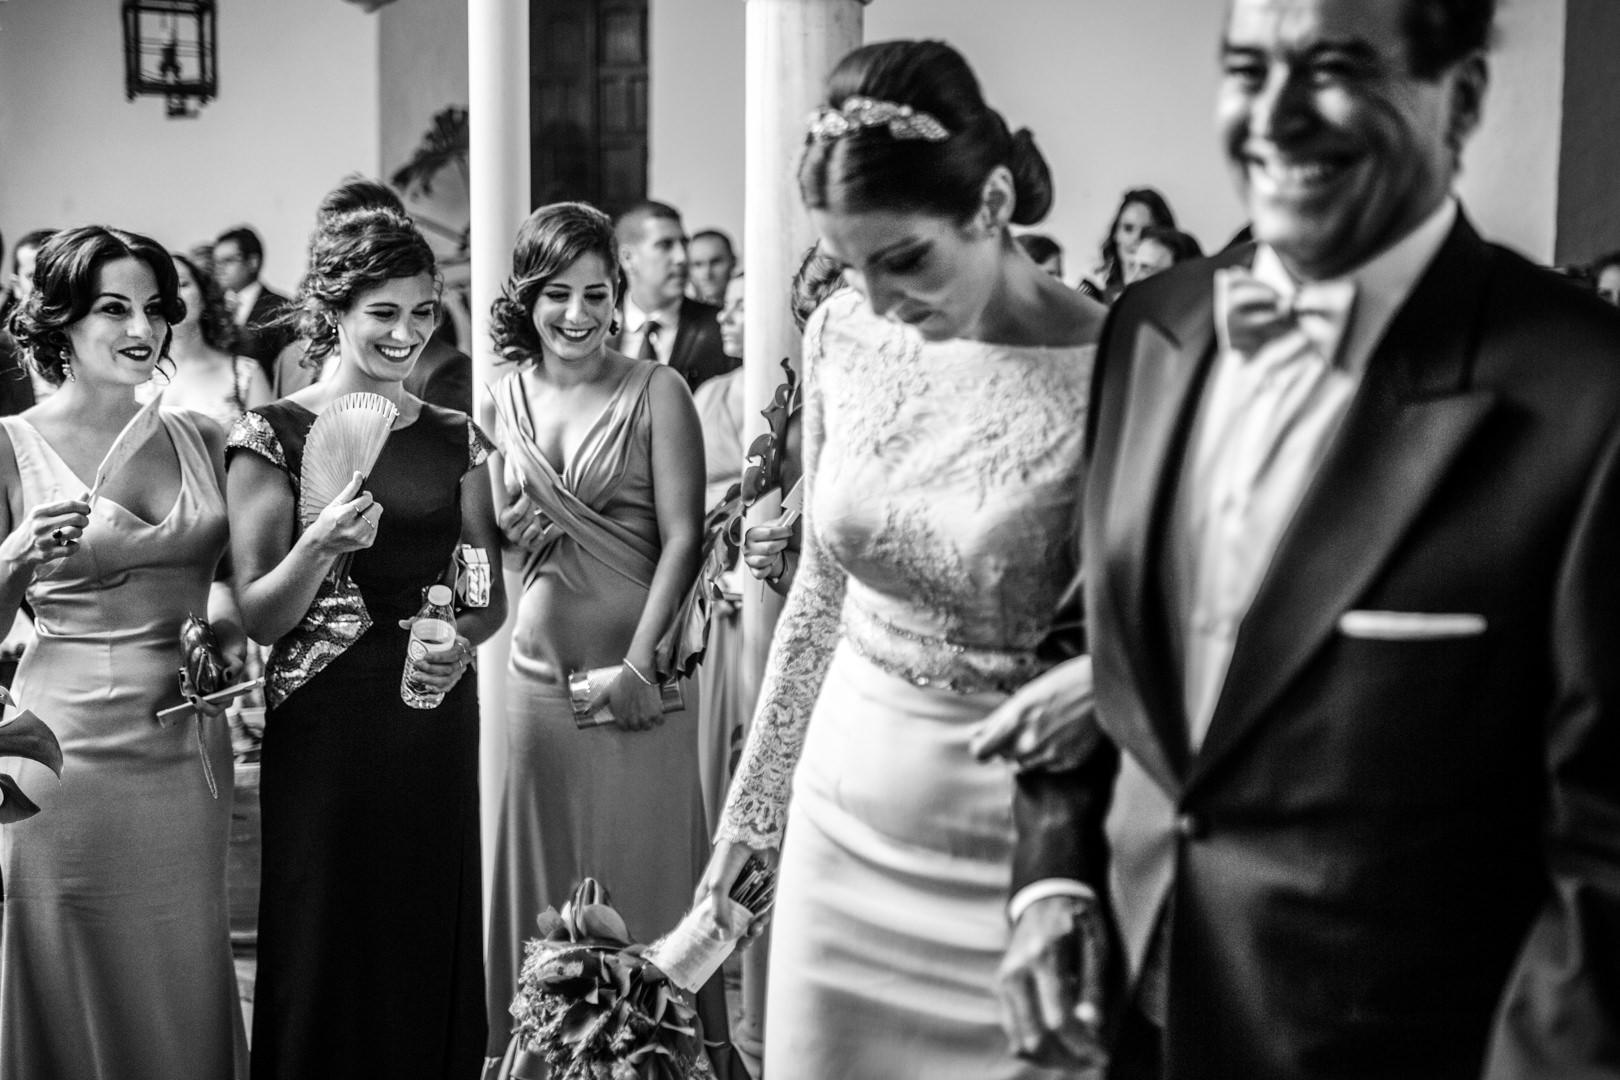 Boda-Sevilla-Museo-Carmona-Hamburgo-Maria-Carles-engagement-Rafael-Torres-fotografo-bodas-sevilla-madrid-barcelona-wedding-photographer--16.jpg